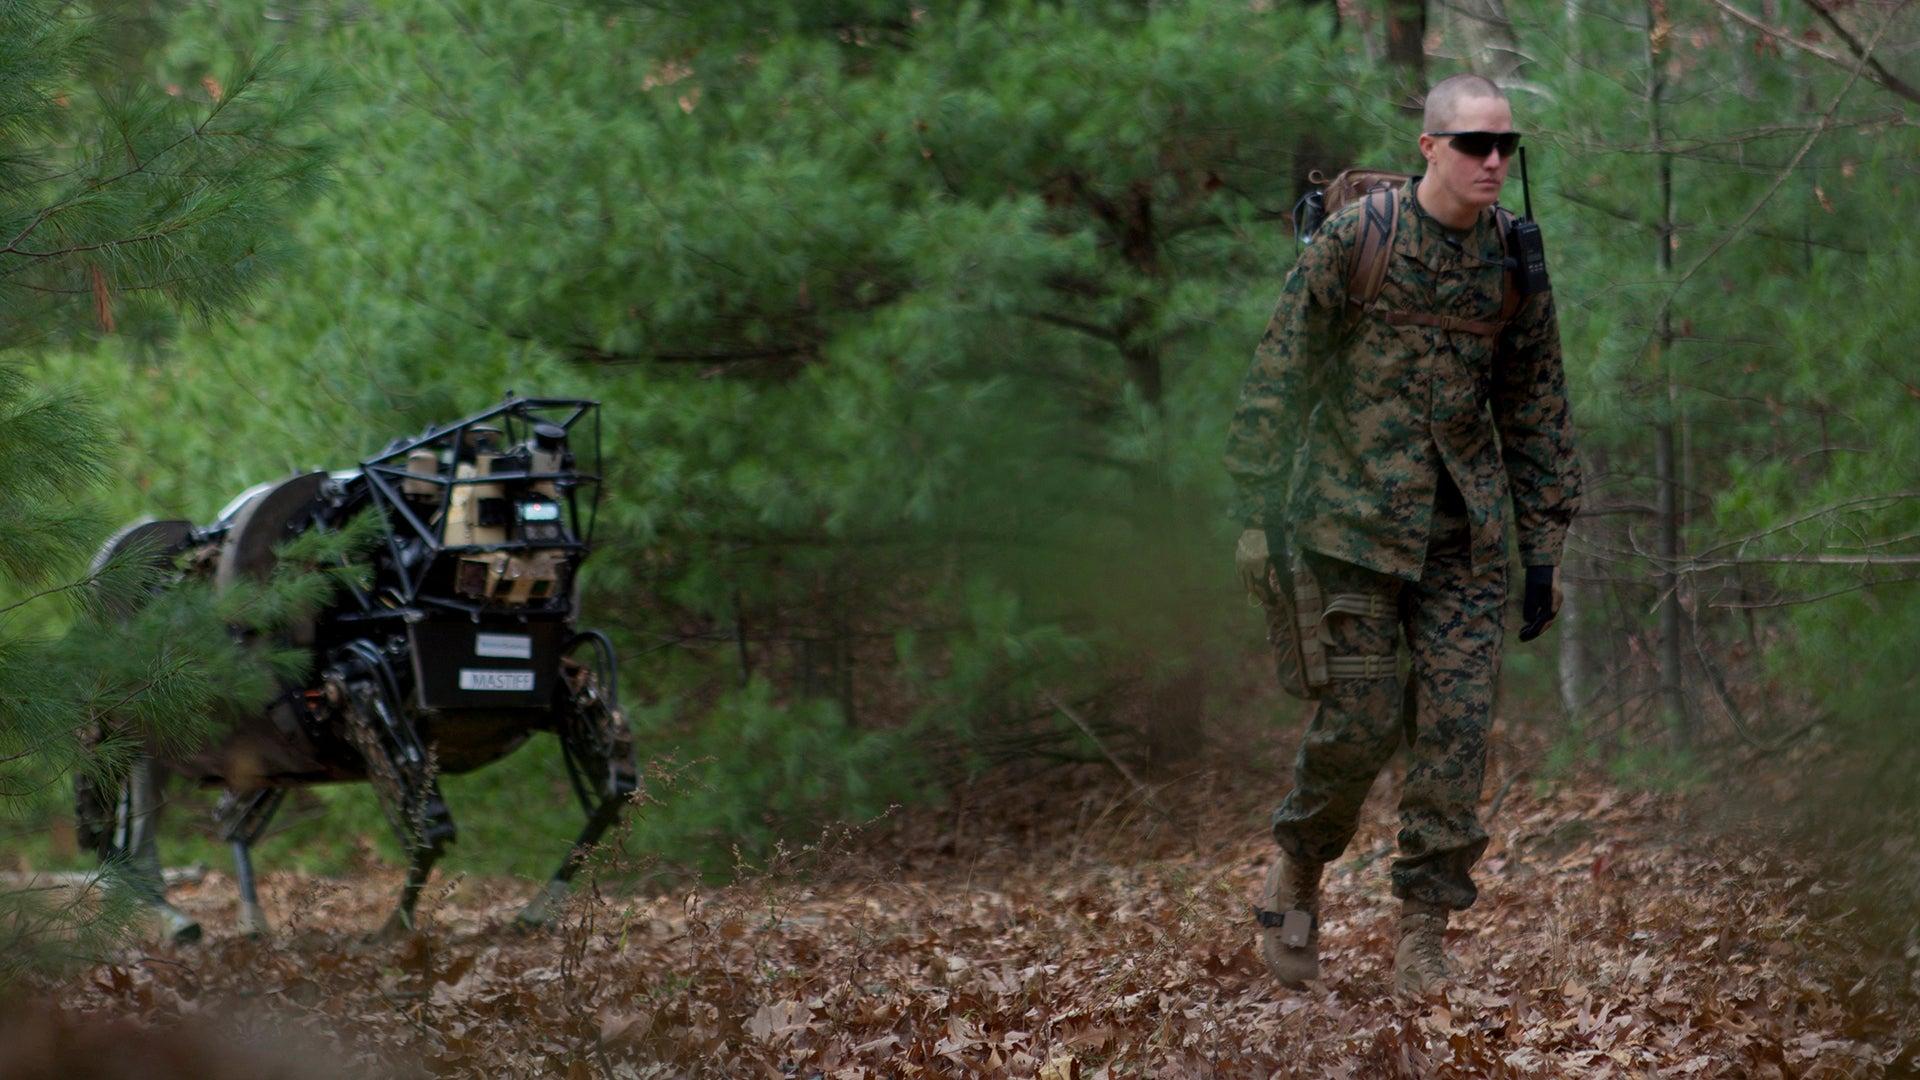 marine corps robot mule